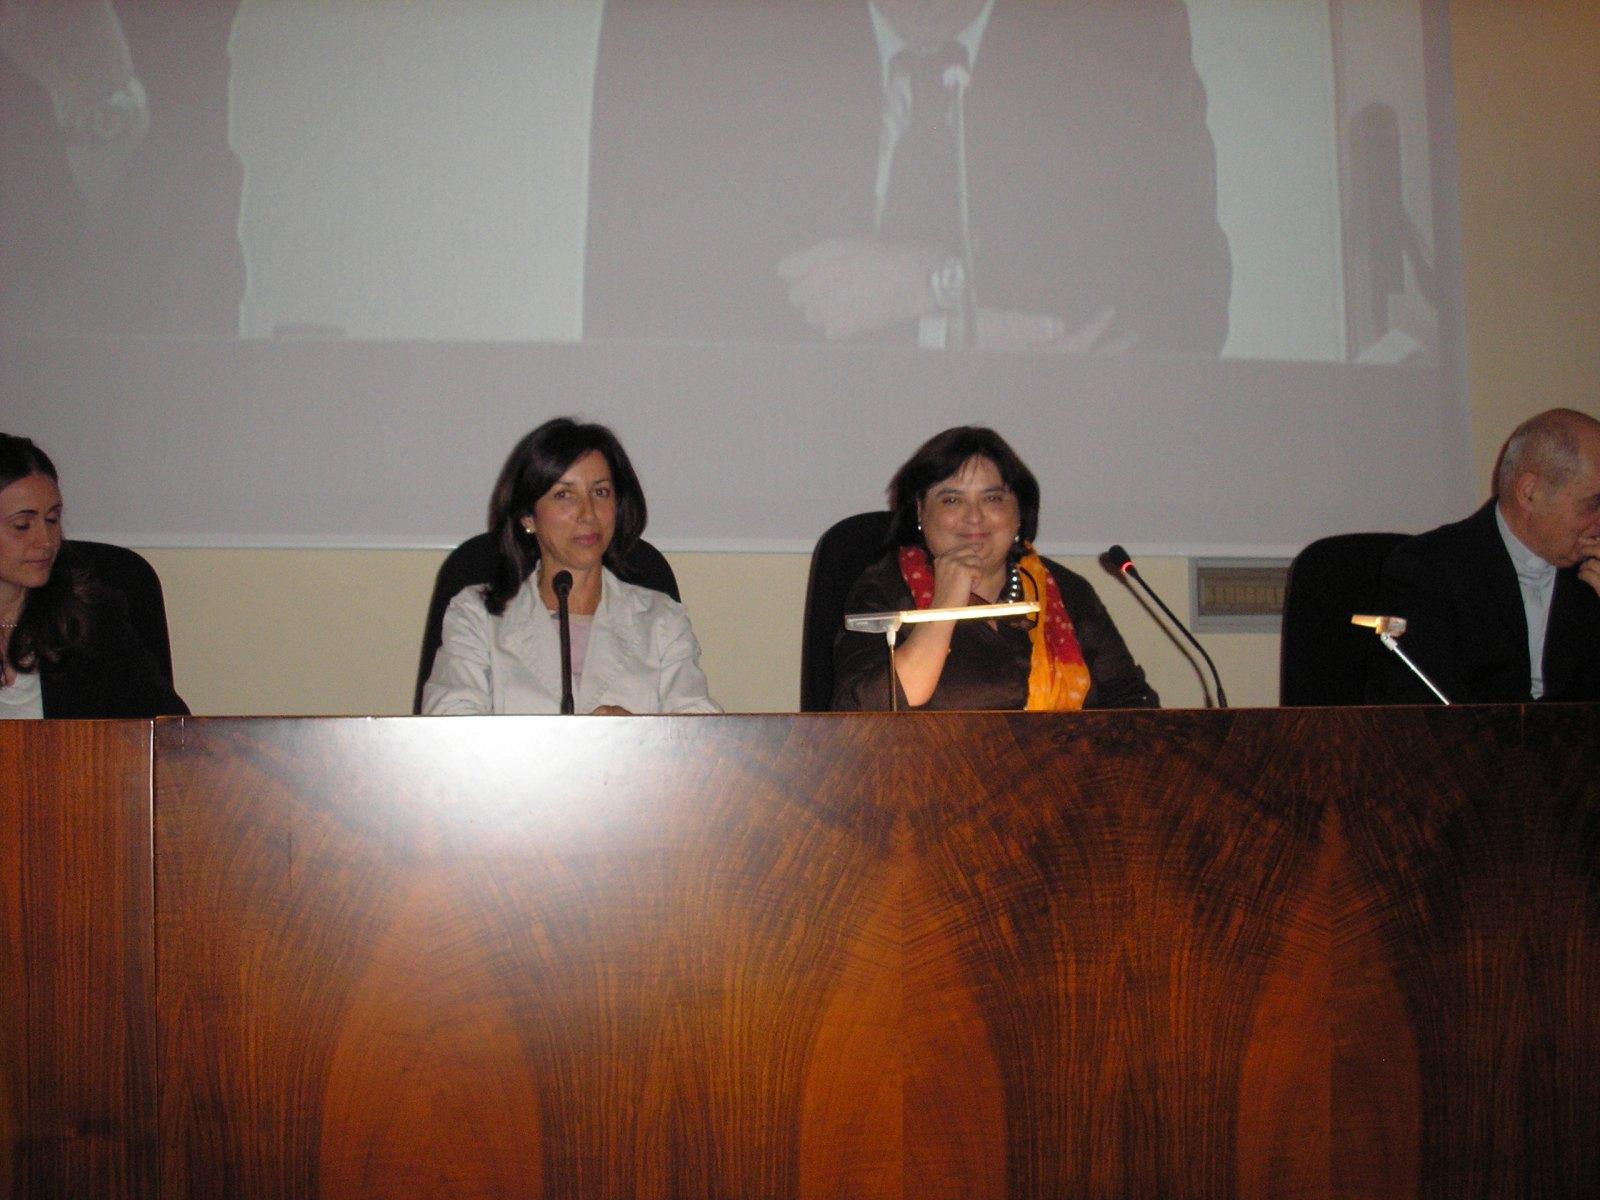 Mariangela Severi, Emma Bianchi, Elisabetta Bogini